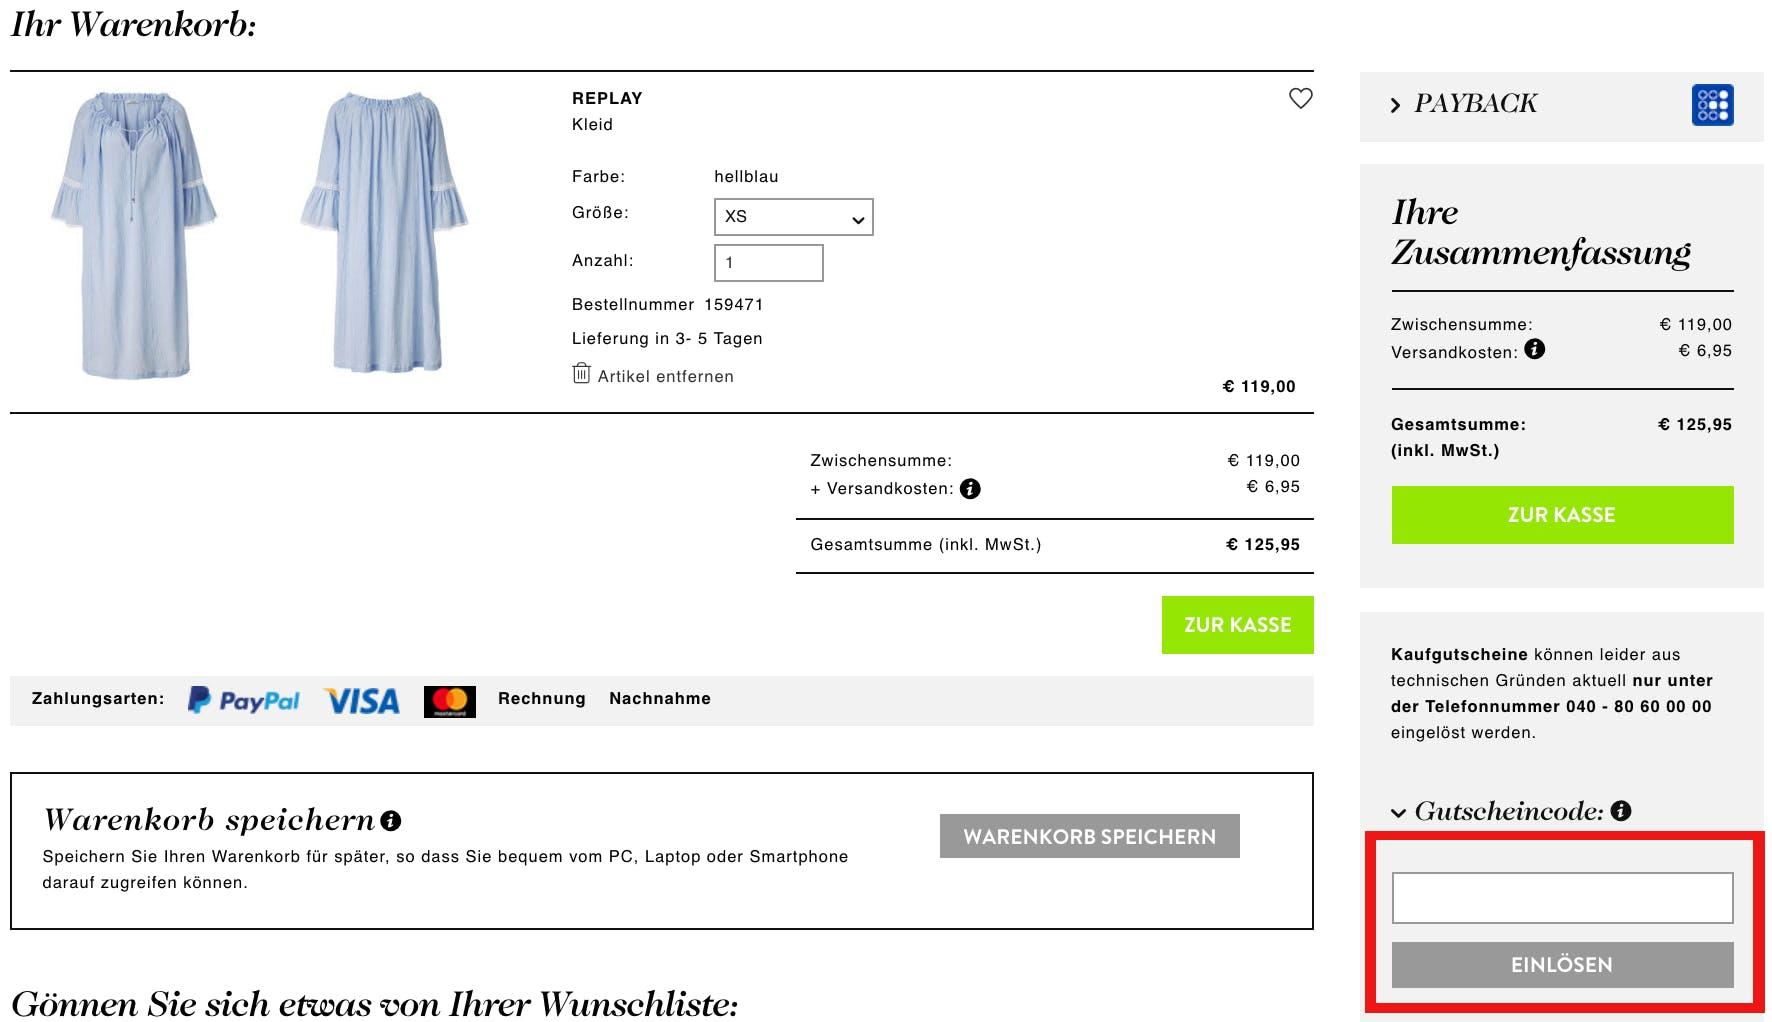 brands4friends Gutschein • 8€ Rabatt • Januar 2020